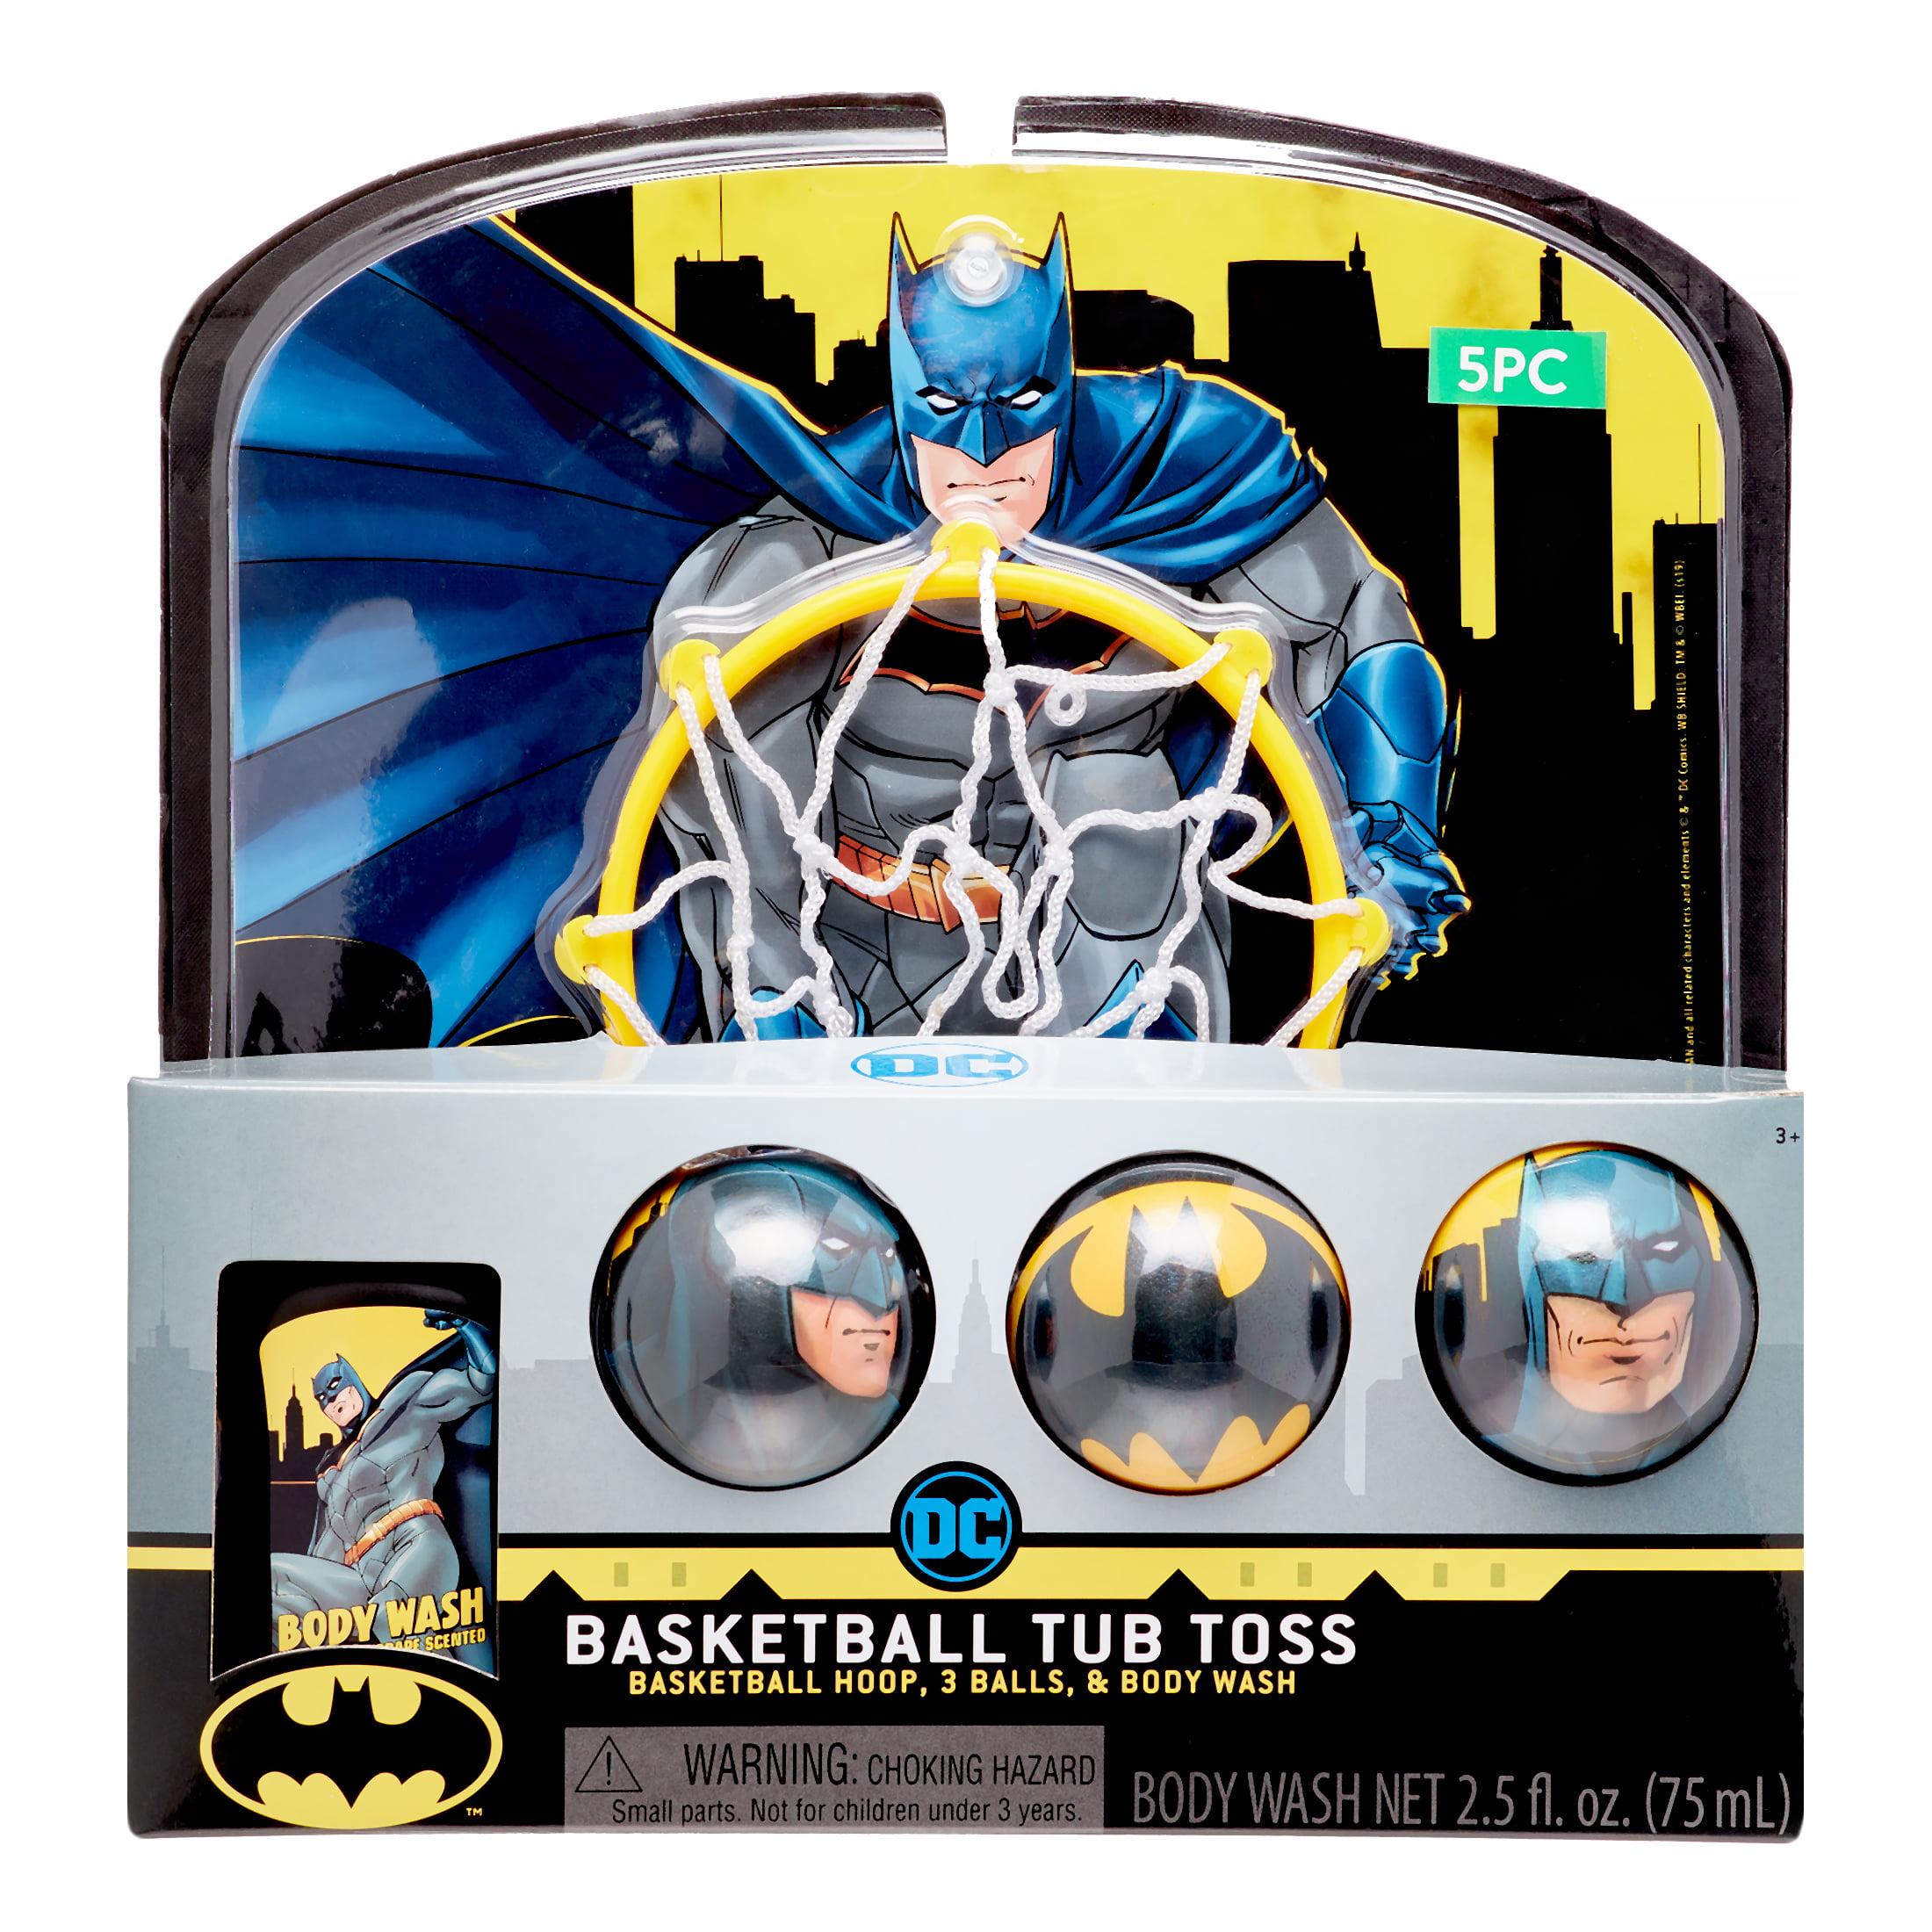 Batman 5 Piece Basketball Tub Toss Bath Game And Body Wash